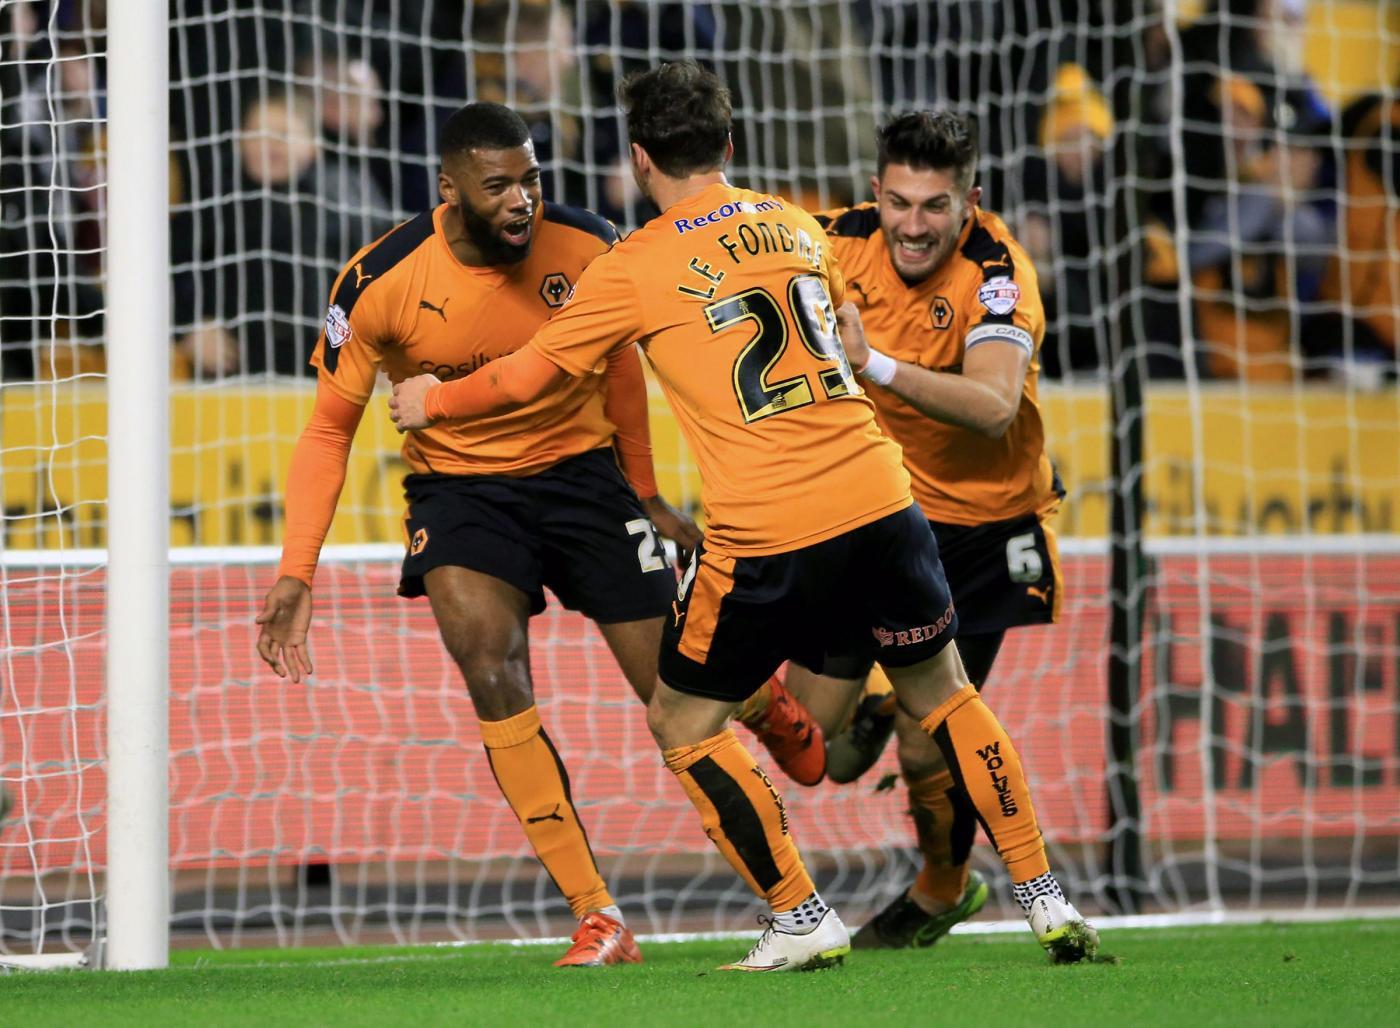 Wolverhampton-Leeds 22 novembre, analisi e pronostico Championship giornata 18